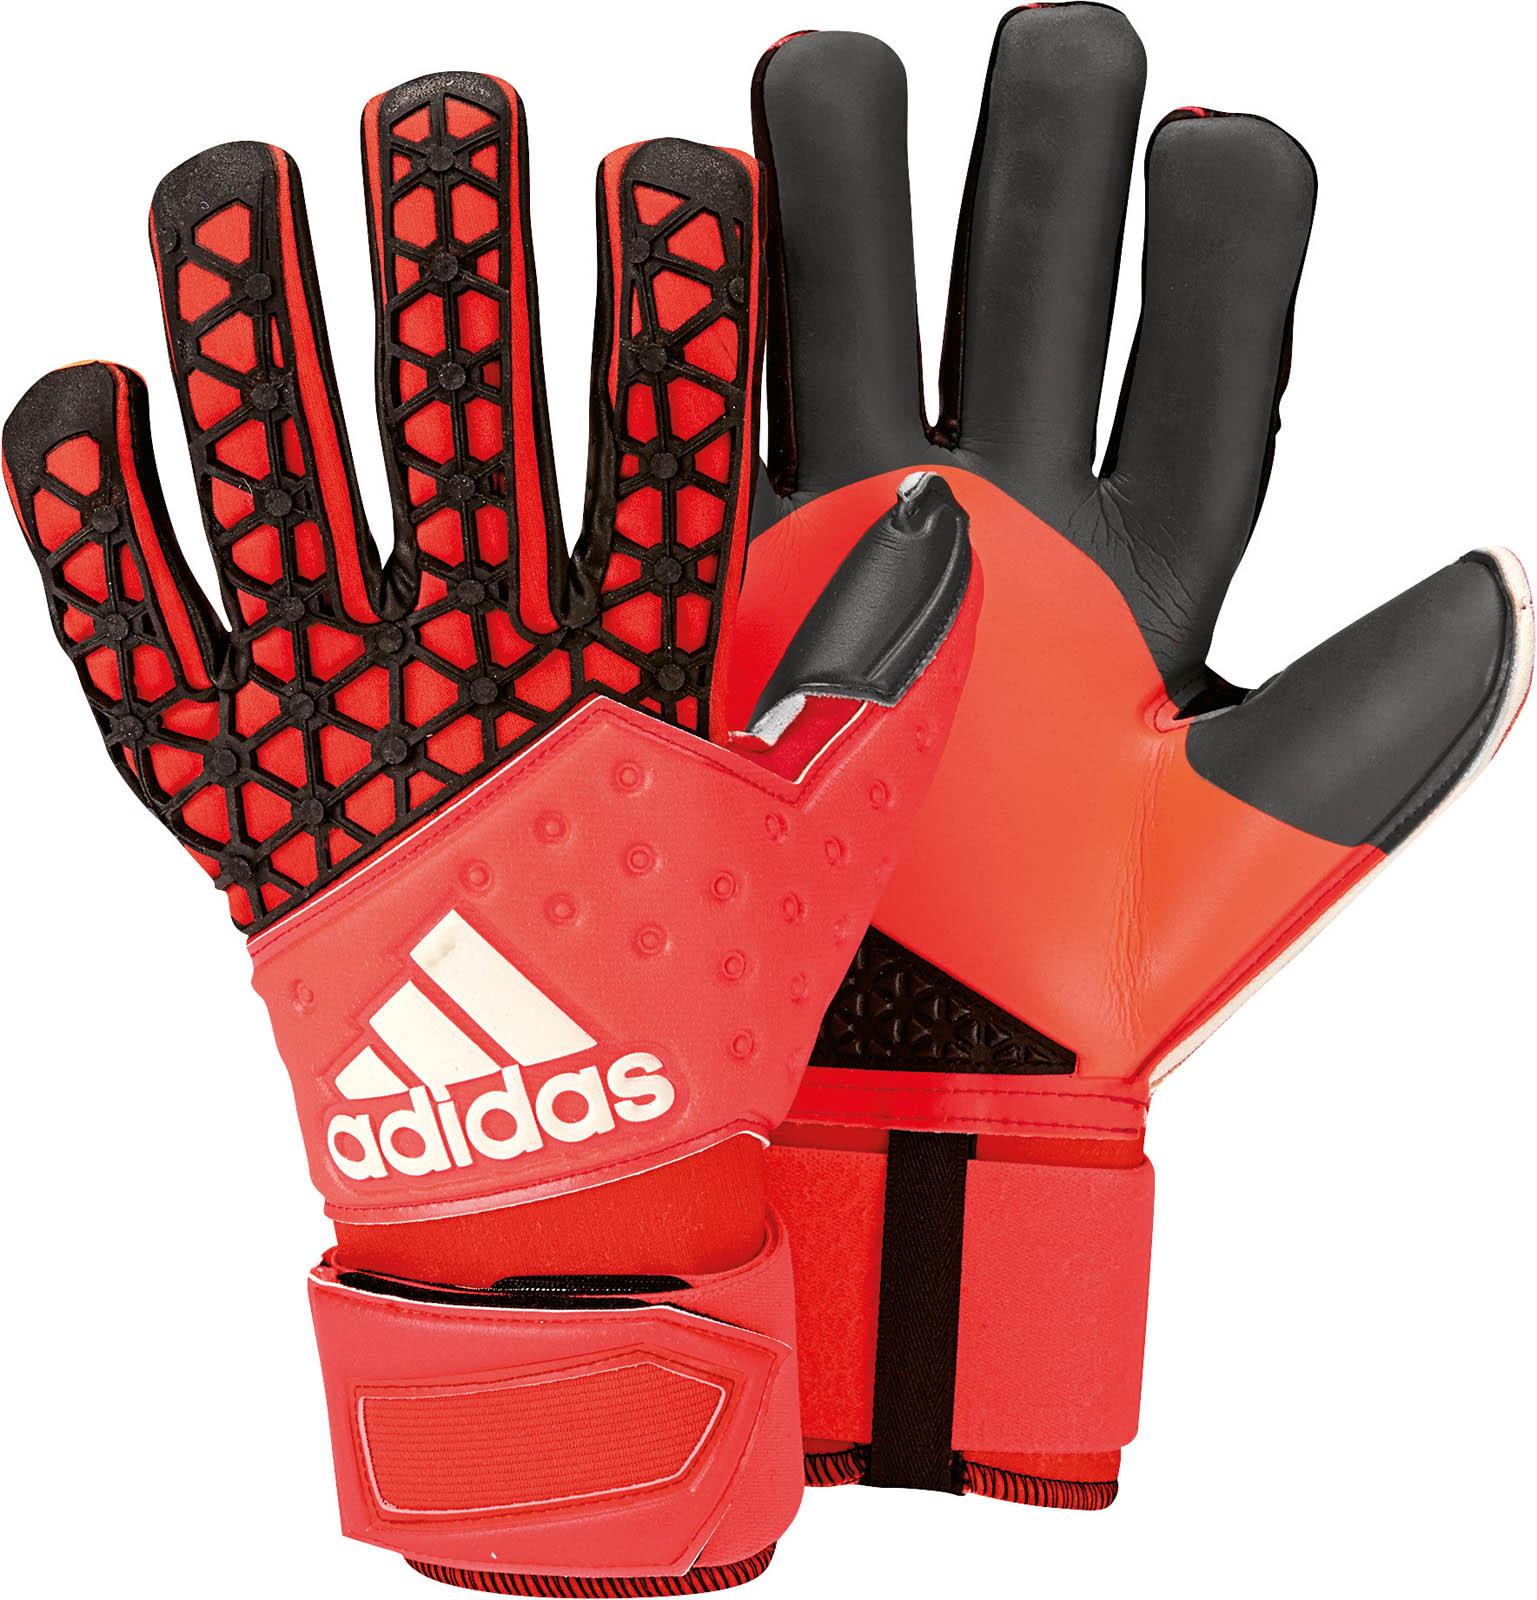 Adidas Predator Fingersave Junior Goalkeeper Gloves Youth ... |Goalkeeper Gloves Adidas 2015